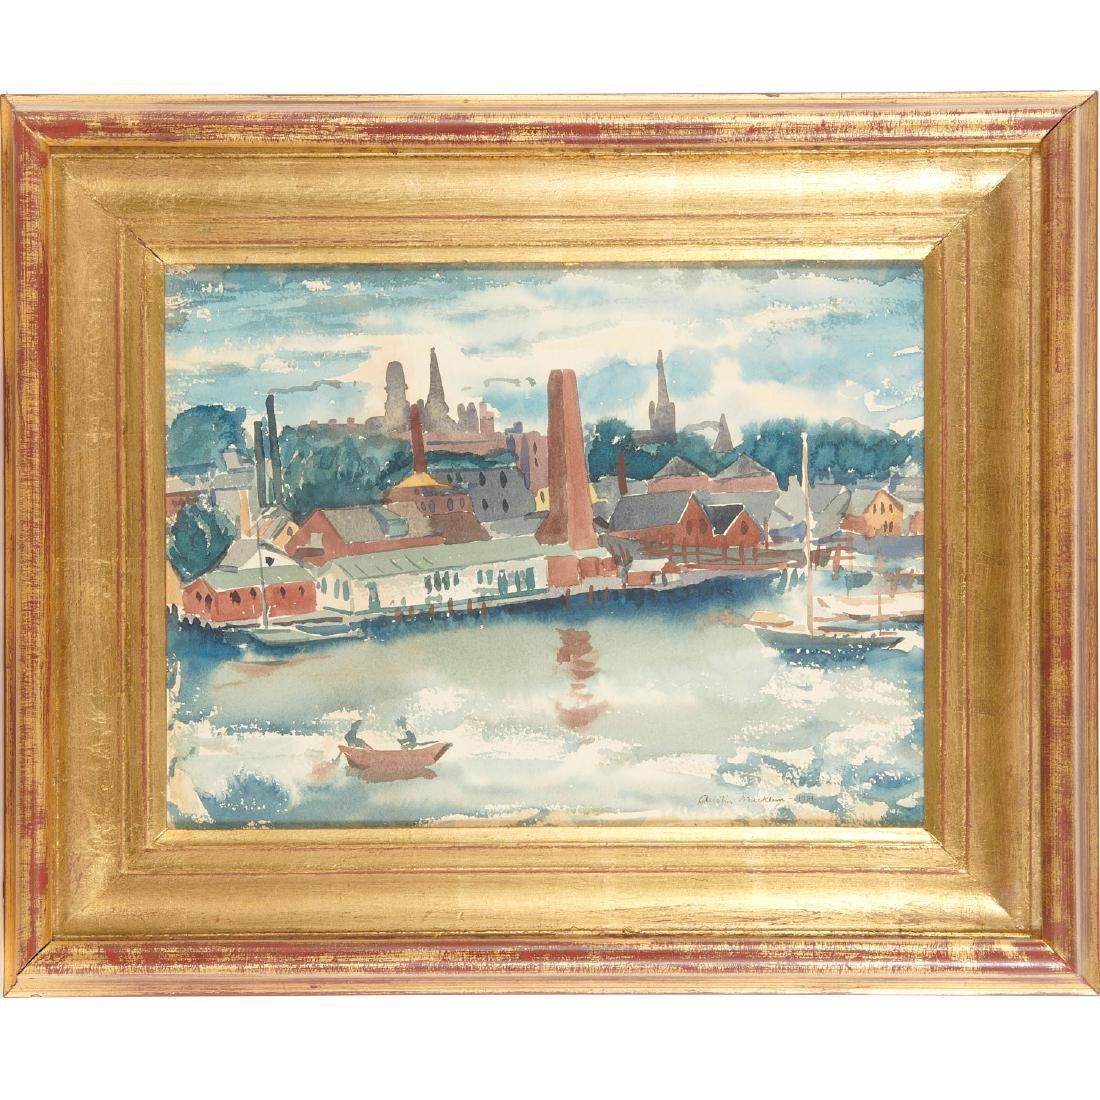 Austin Mecklem, painting, 1931